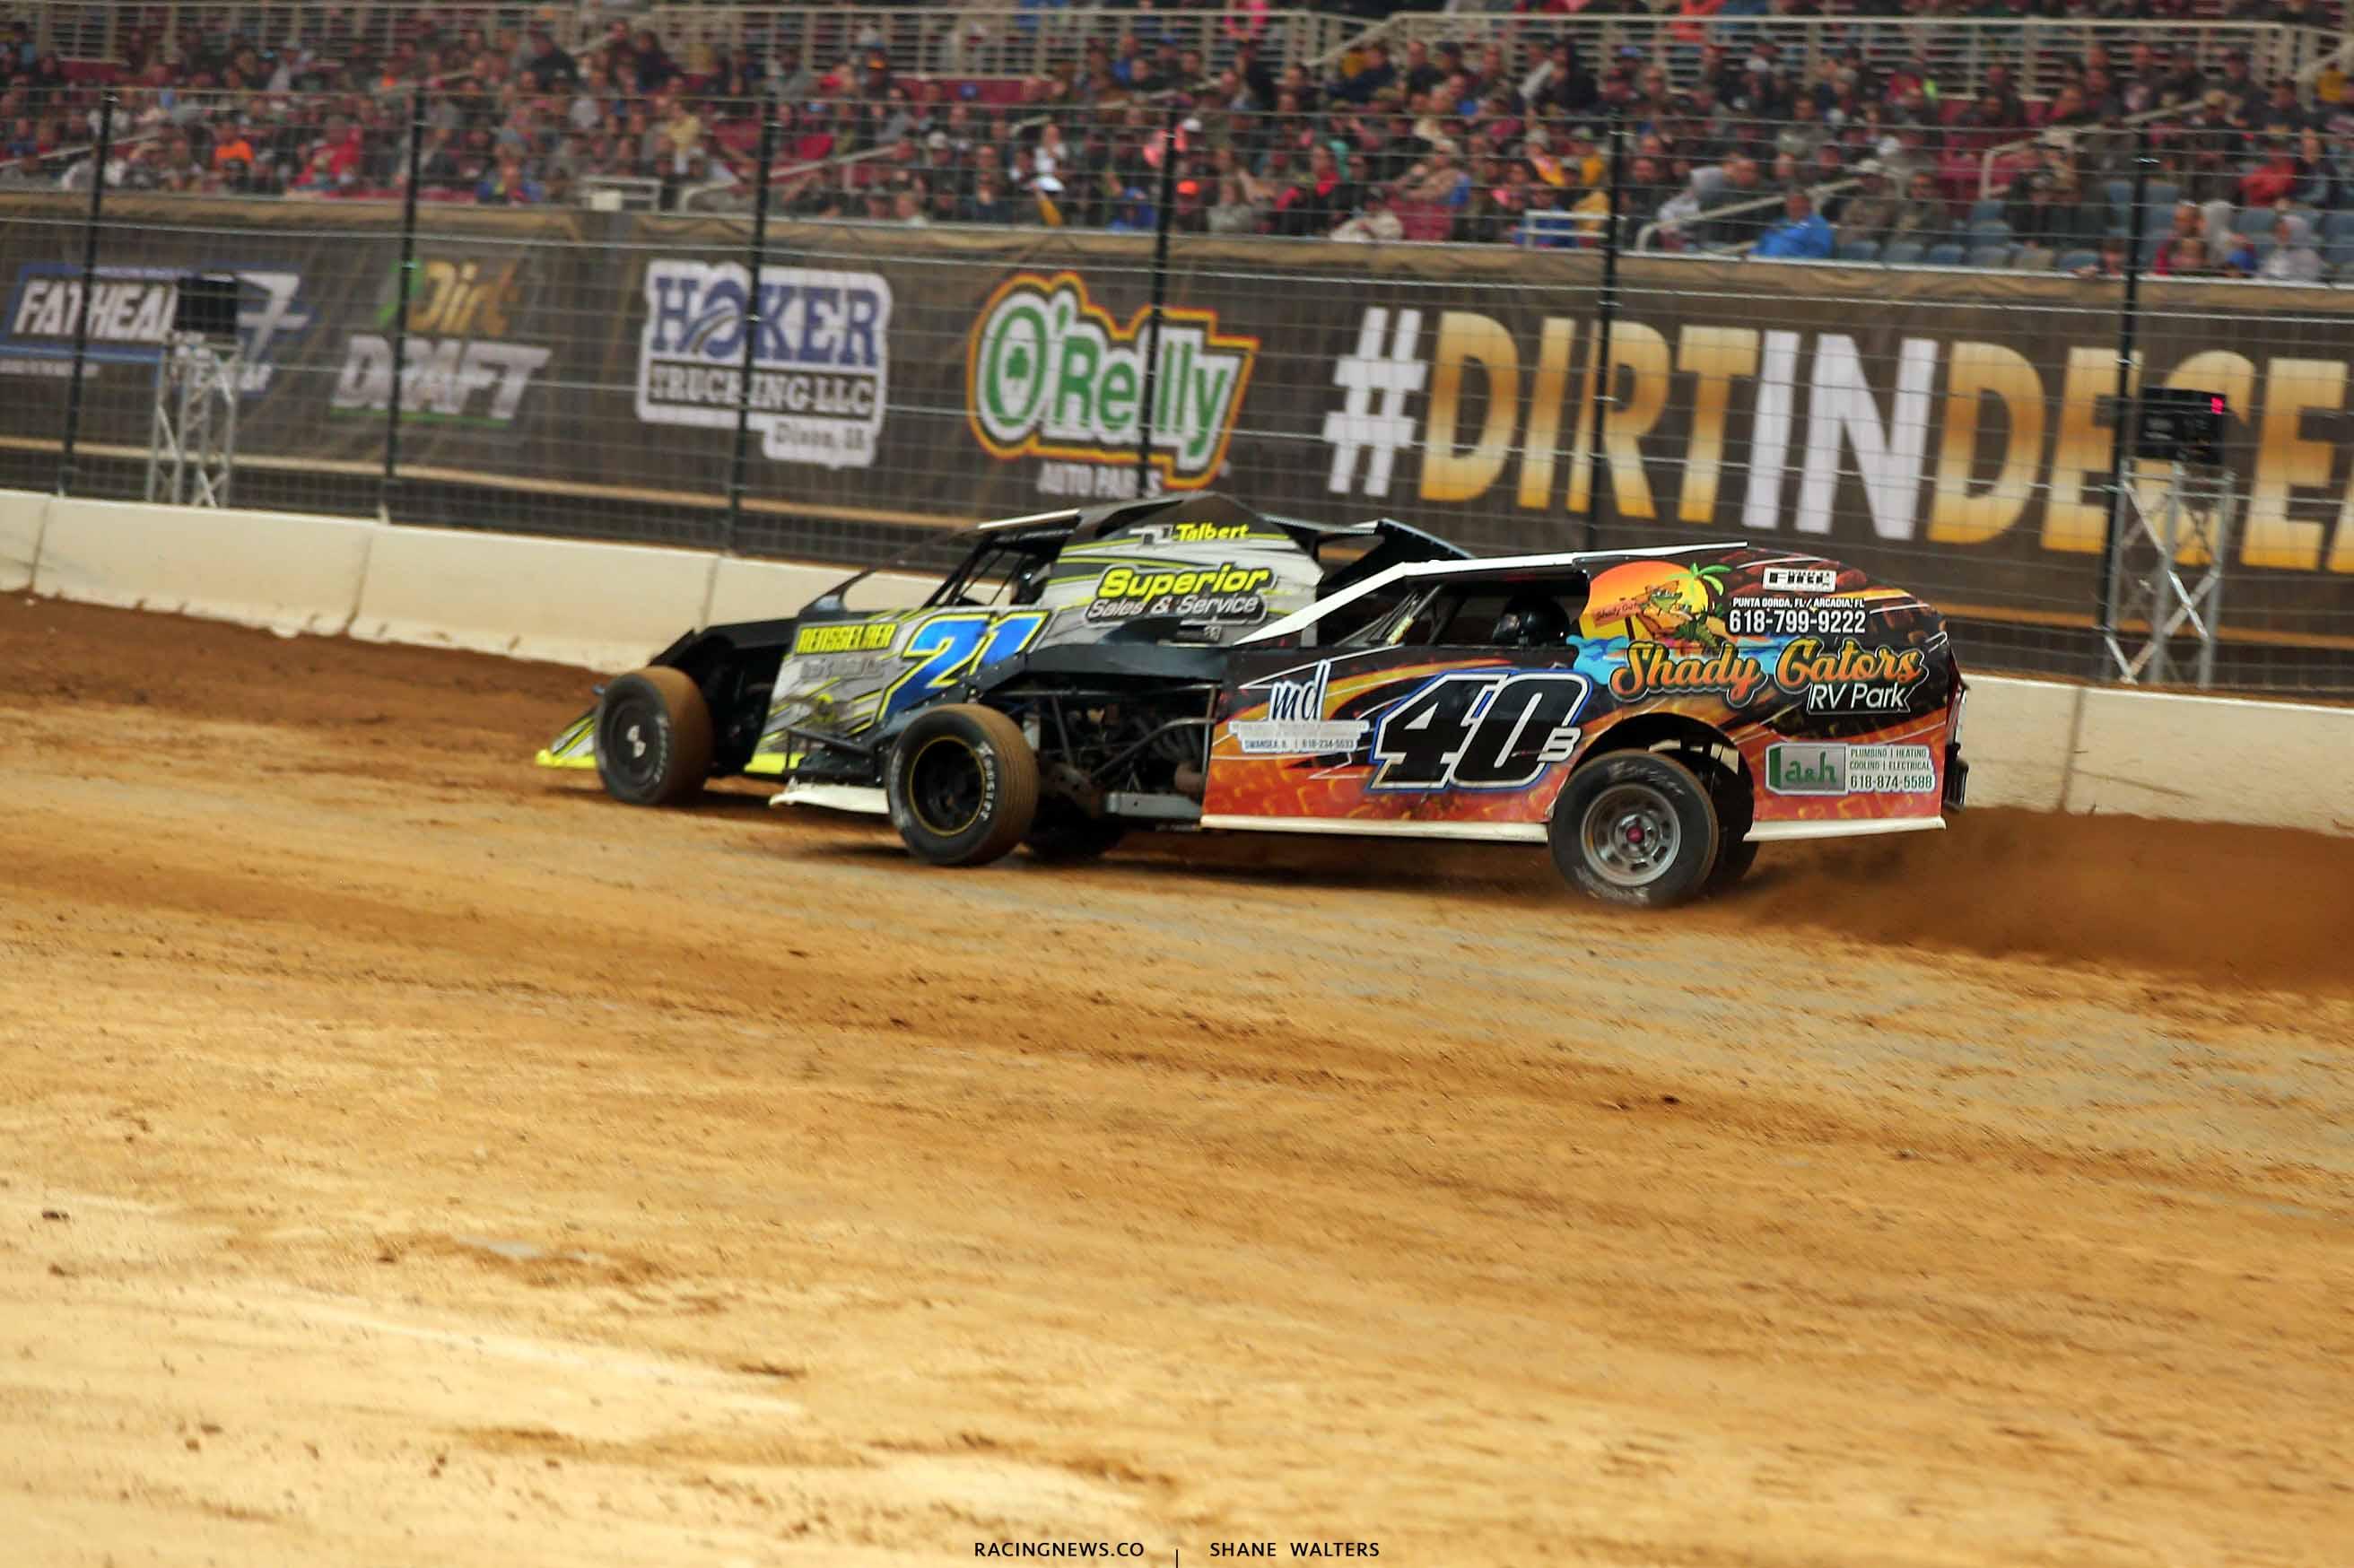 Derek Losh and Kyle Bronson in the Gateway Dirt Nationals - Dirt Modifieds 2891